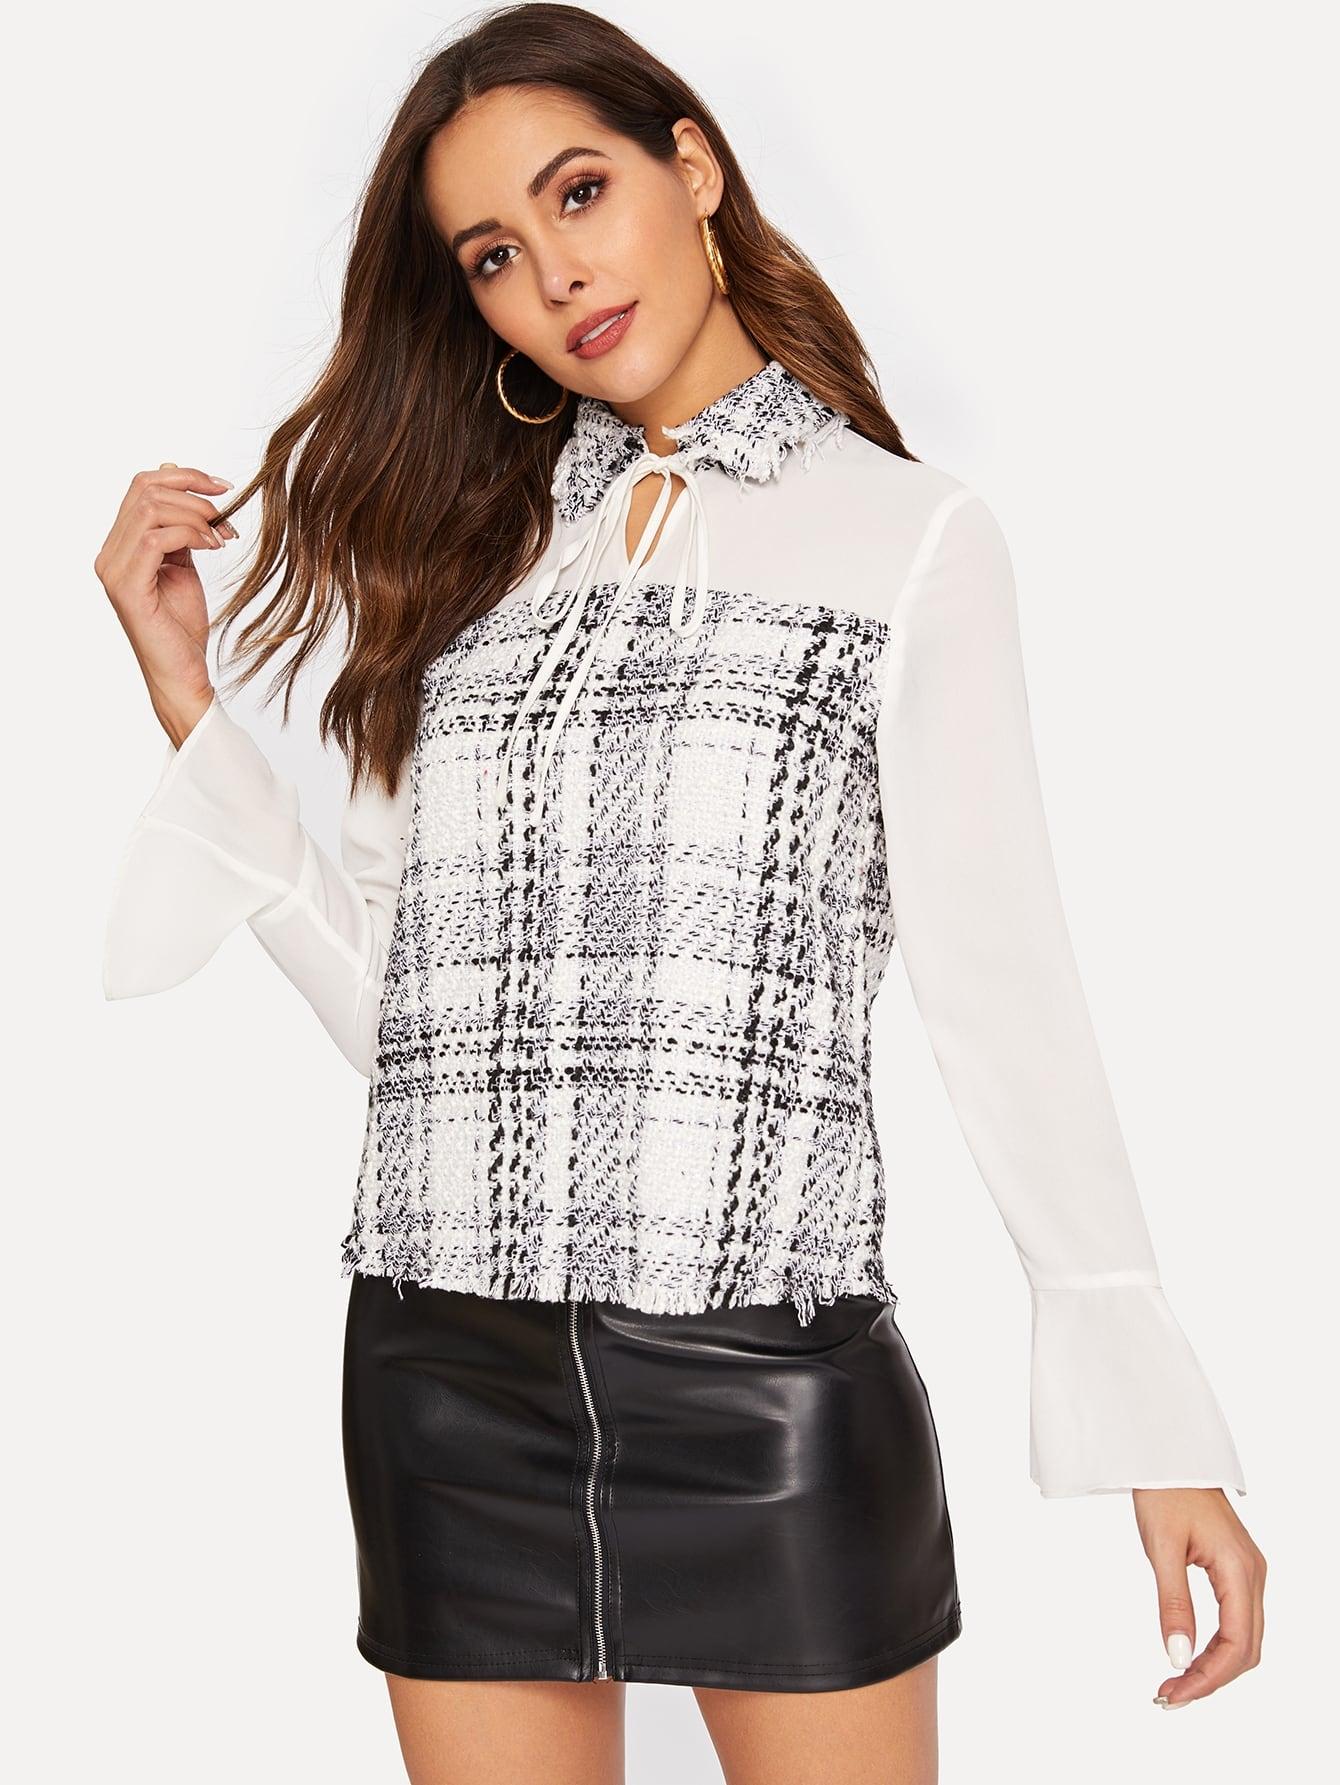 50s Plaid Print Skirt null